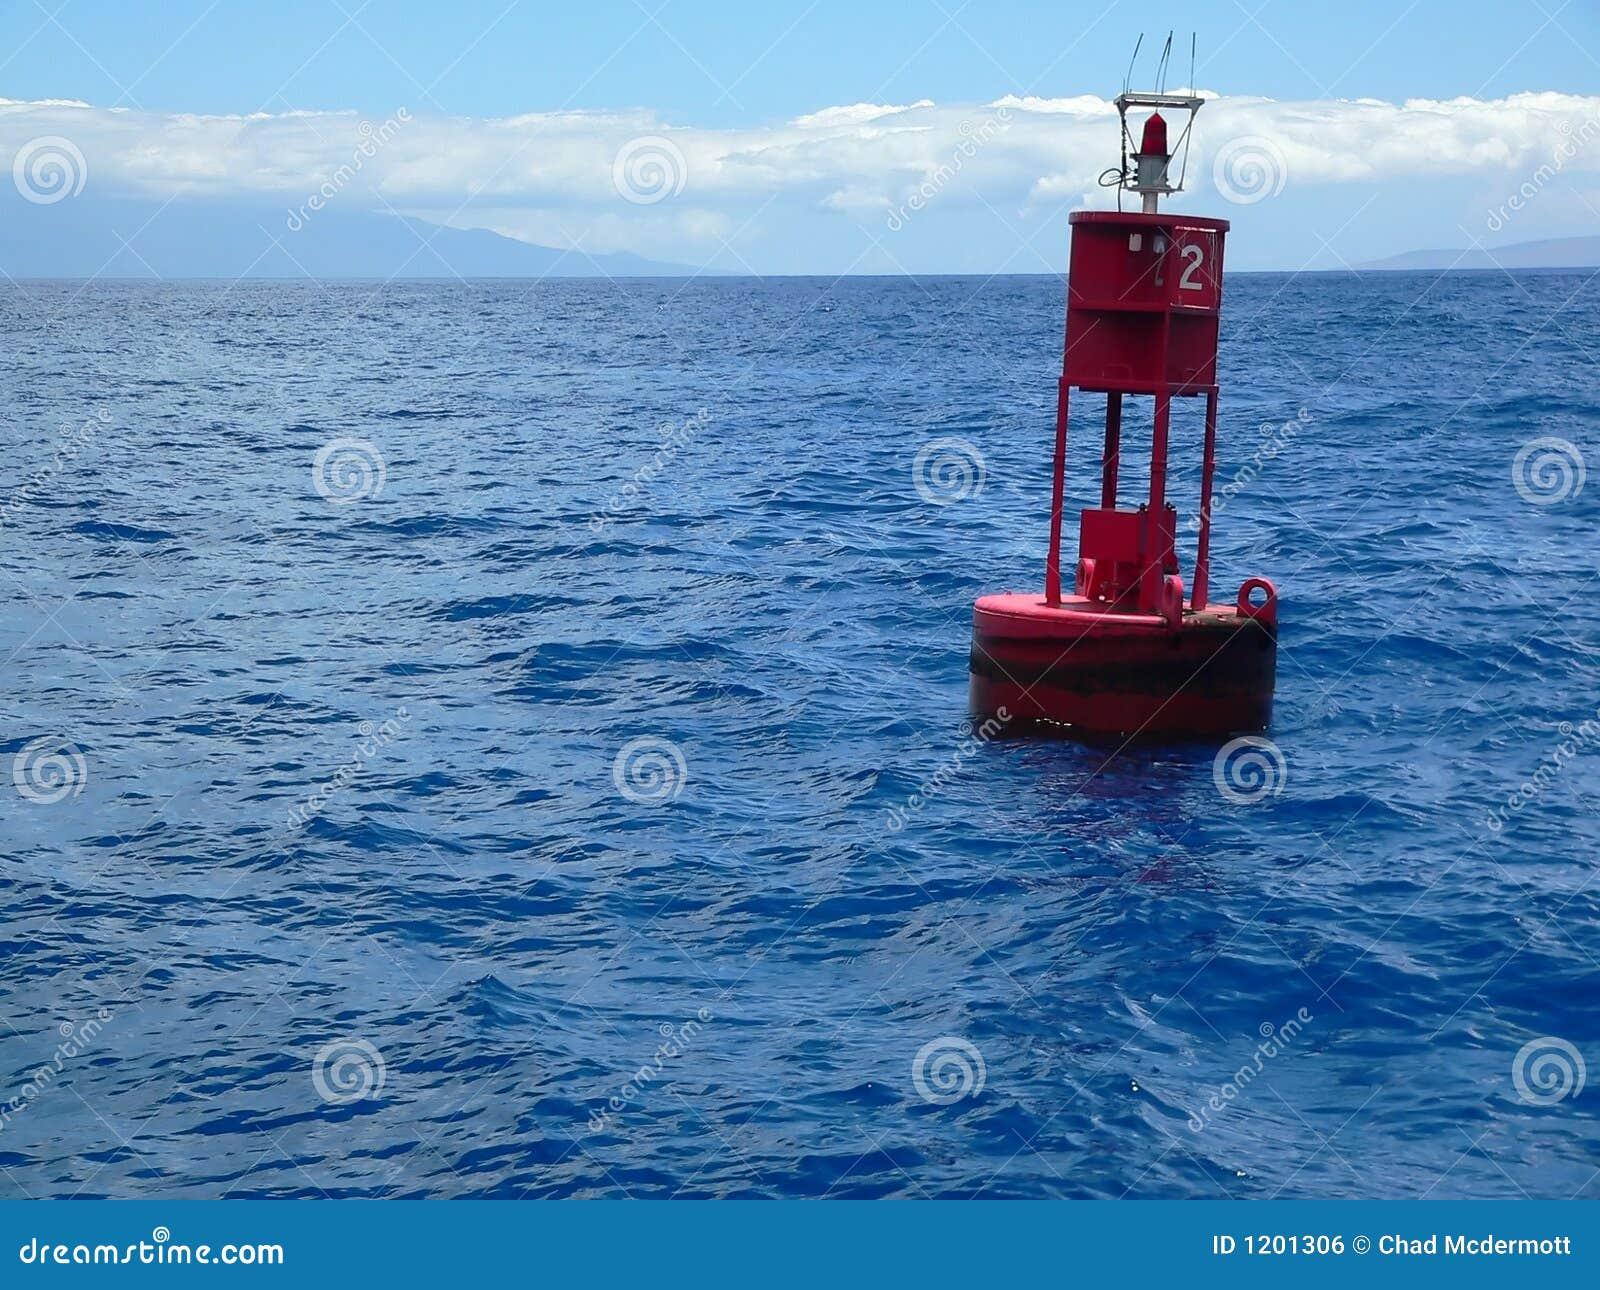 Red Buoy on Ocean